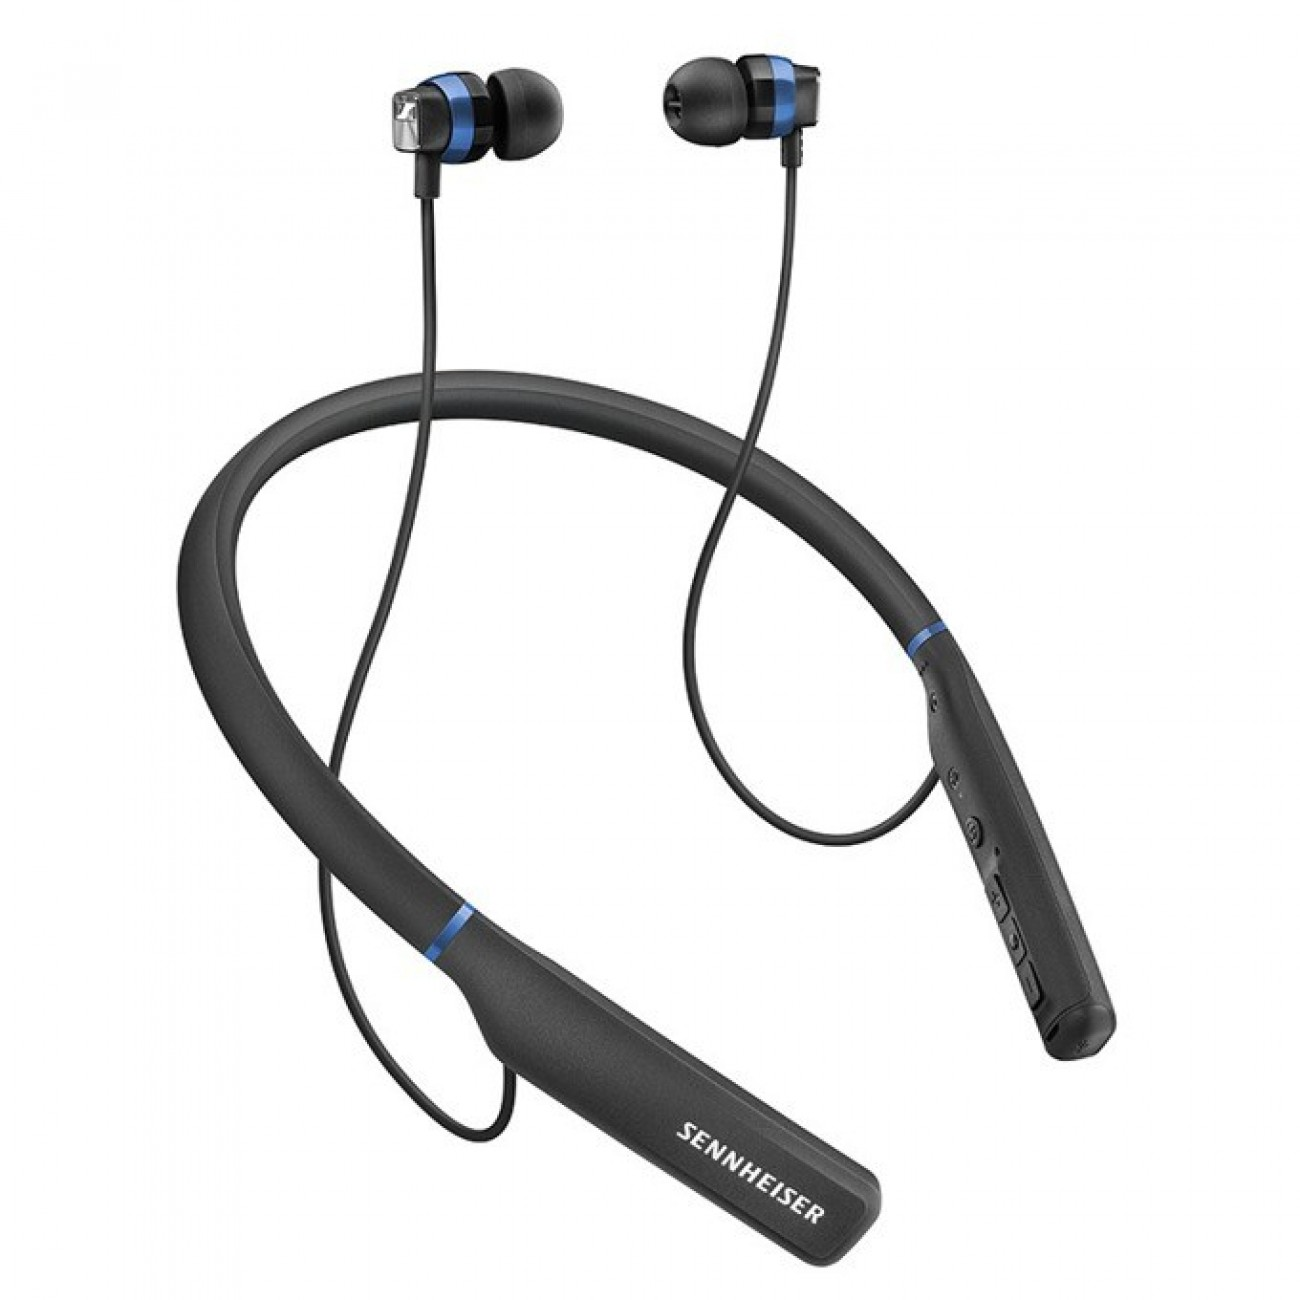 Слушалки Sennheiser CX 7.00BT, безжични, микрофон, 17-21000Hz честотен диапазон, черни в Слушалки -  | Alleop